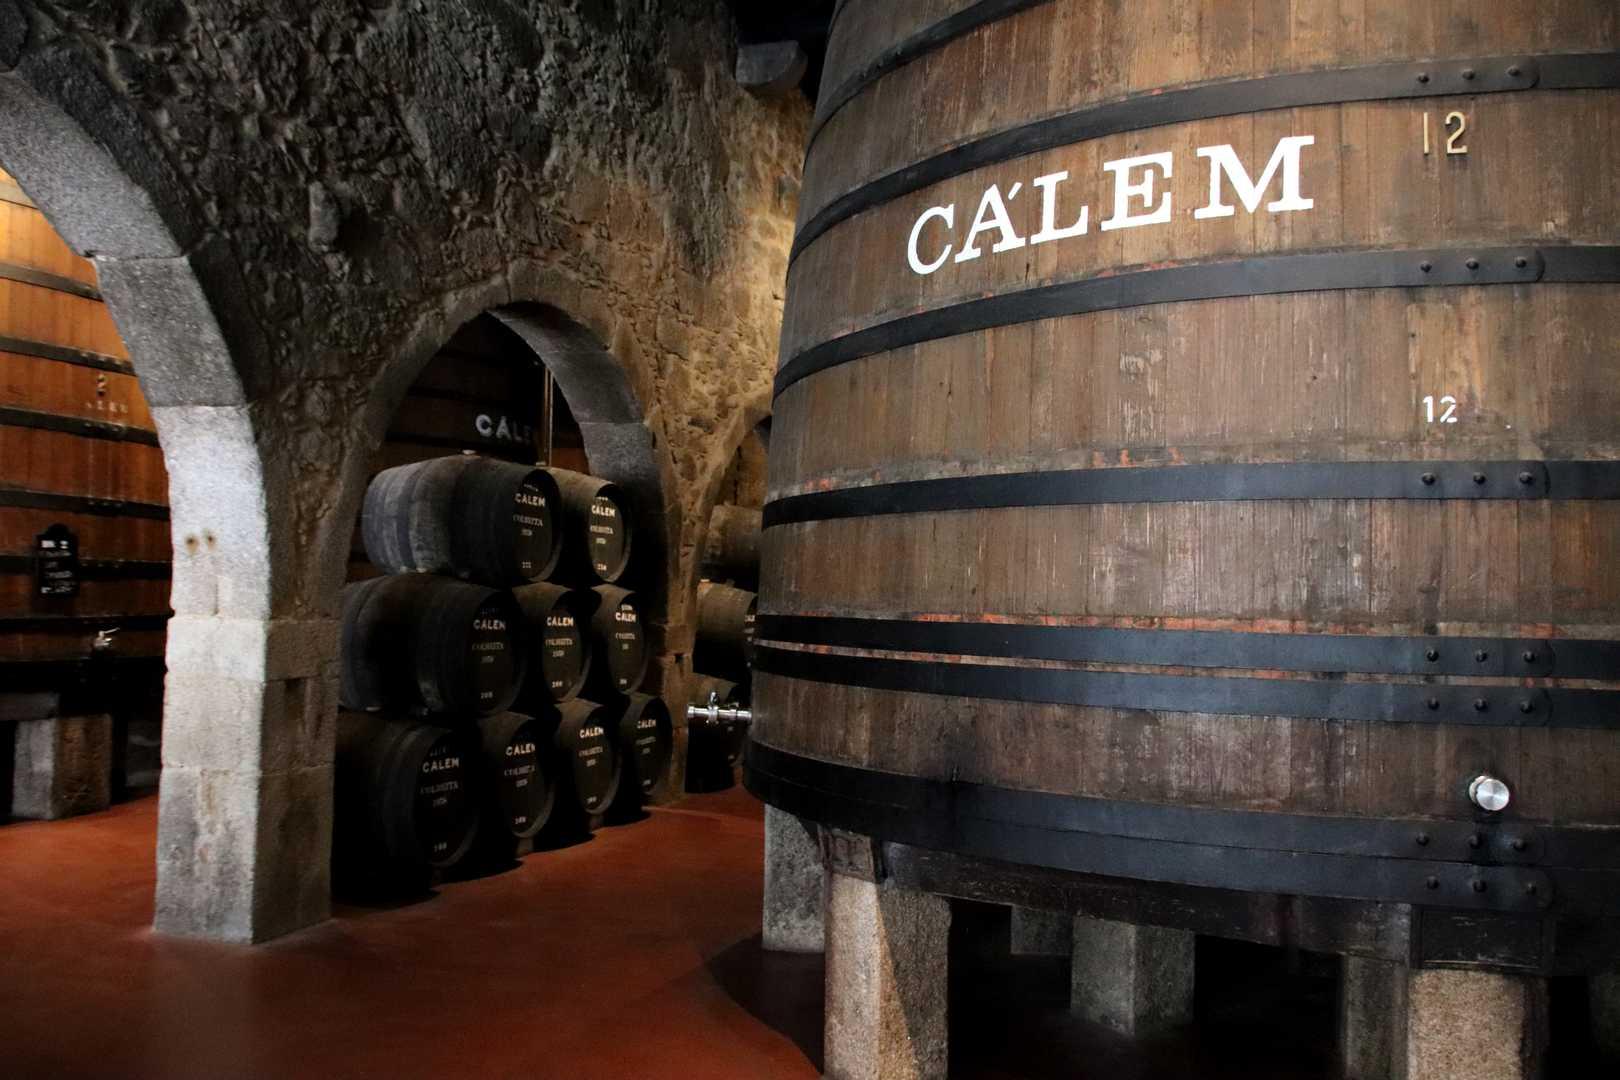 Portugal - Visite des caves de porto de Callem à Vila Nova de Gaia